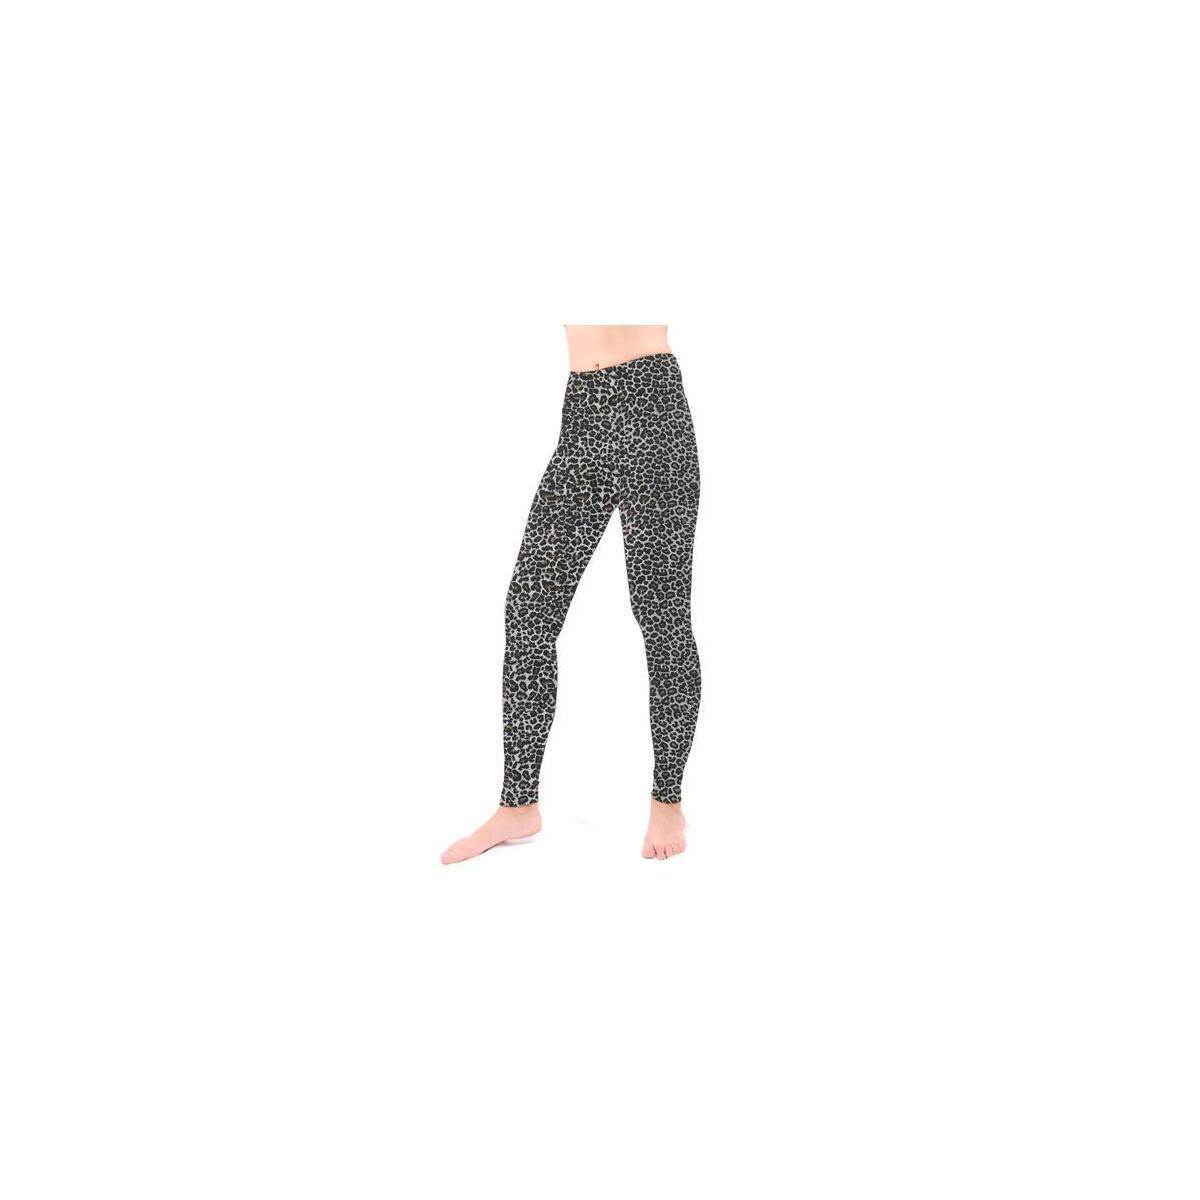 NIRLON -Tiger size 10- Tiger Cotton Leggings for Women High Waist Yoga Pants